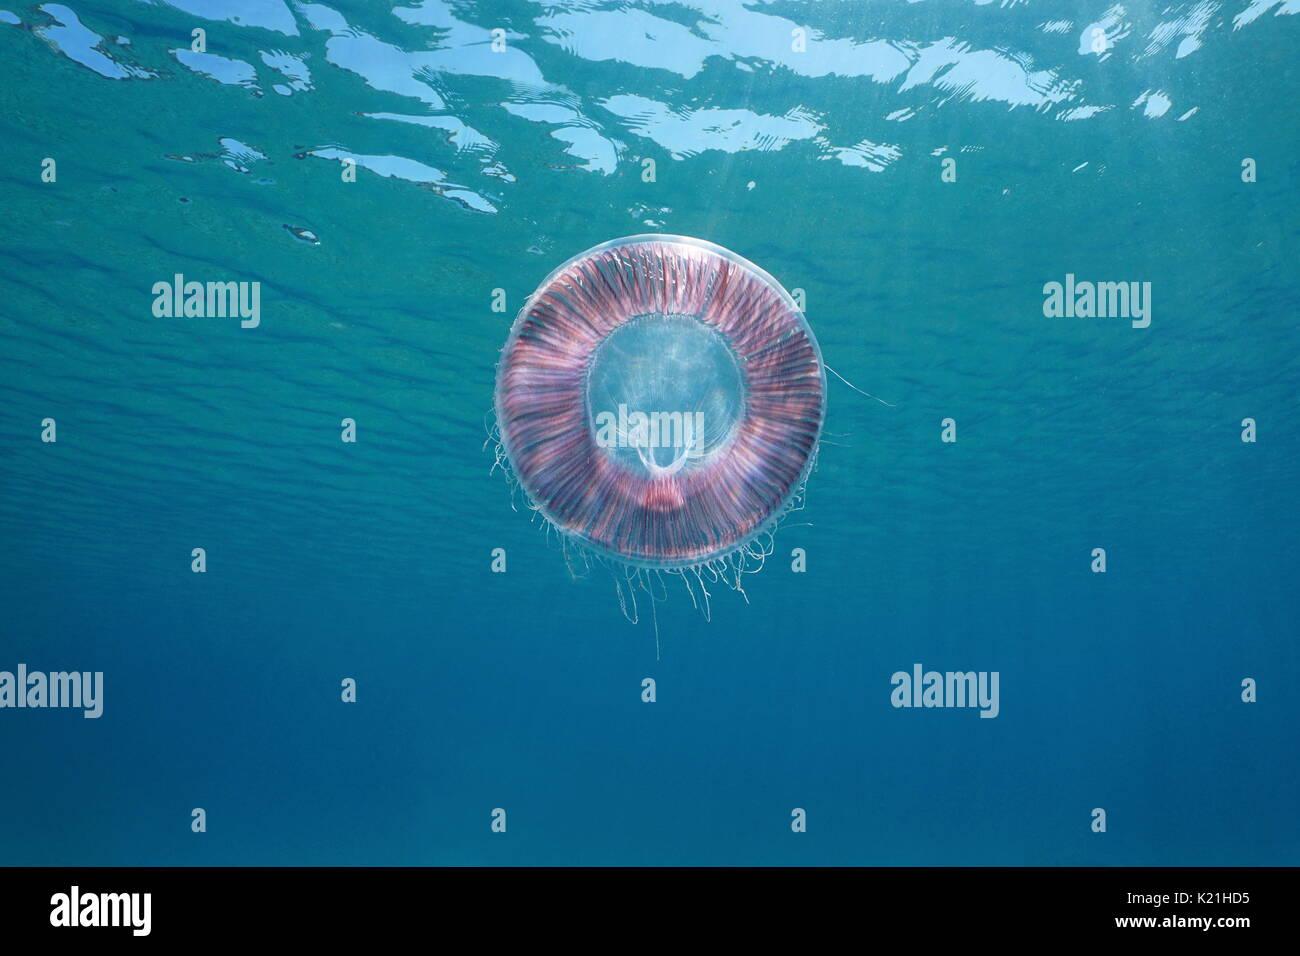 Underwater jellyfish Aequorea in the Mediterranean sea, Spain, Costa Brava, Girona, Catalonia - Stock Image